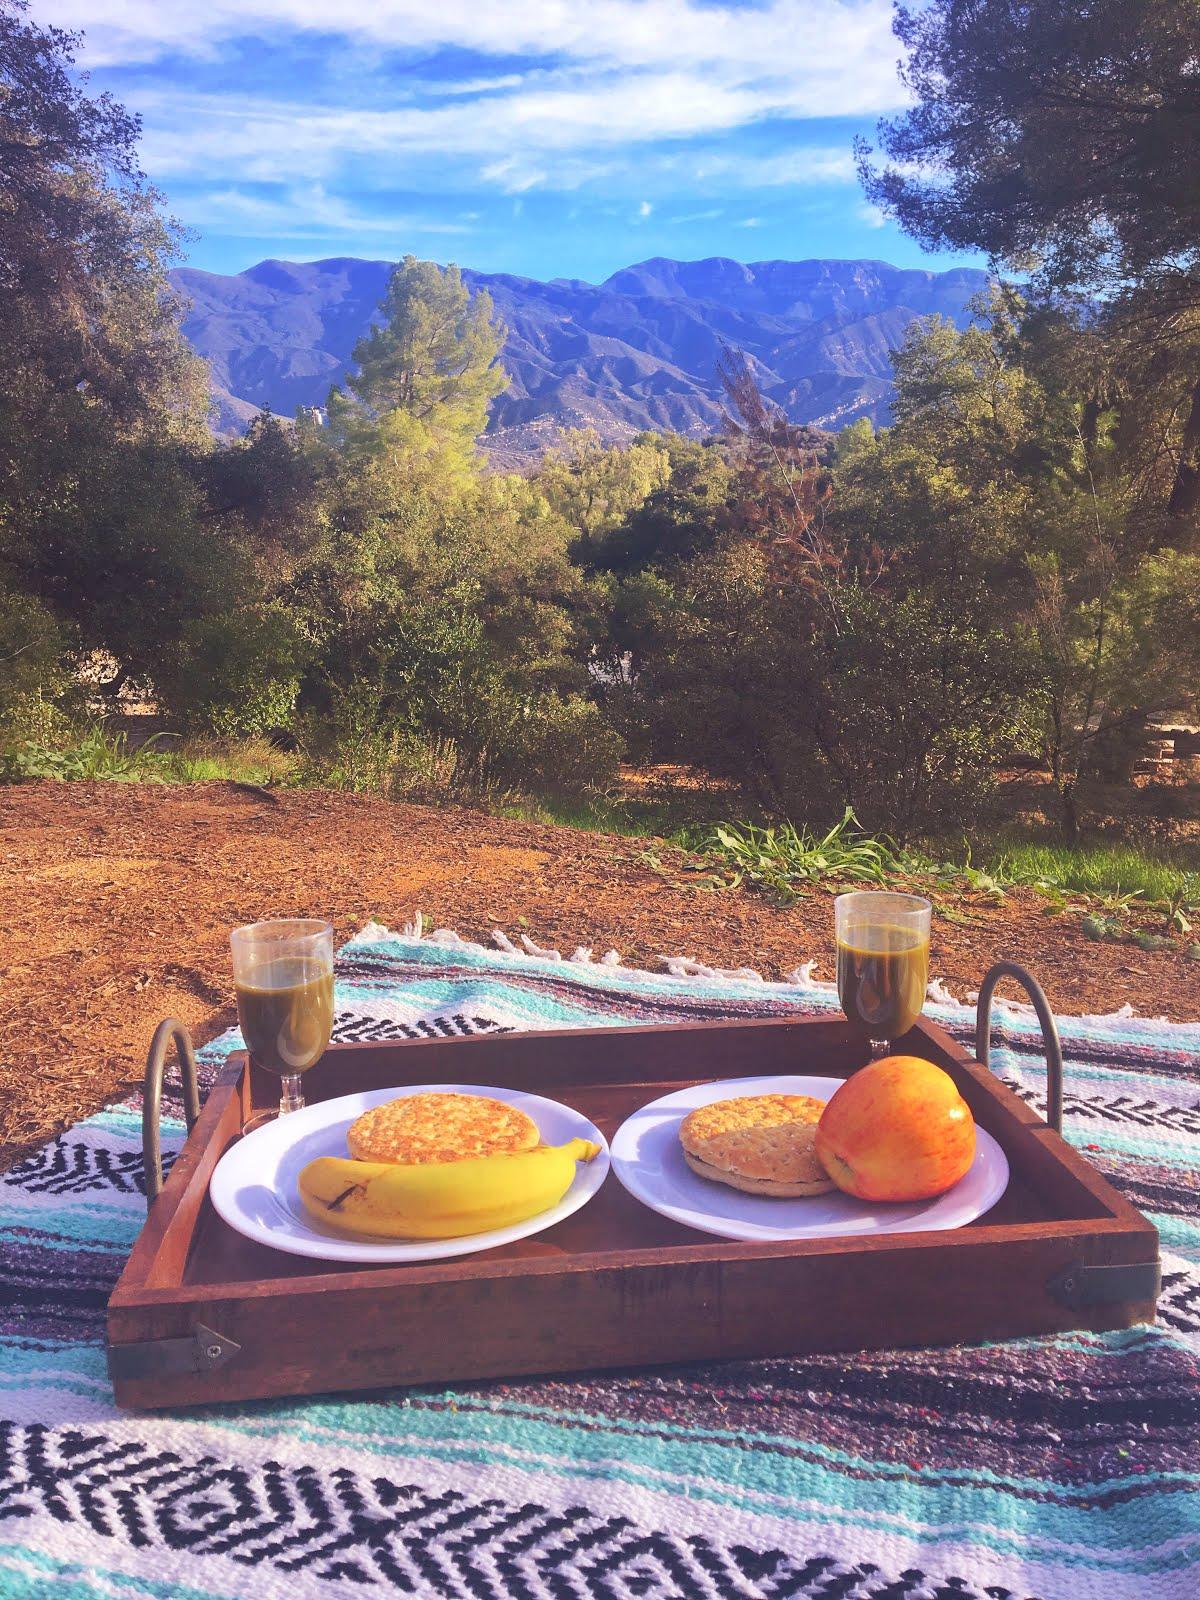 Prius Camping in Ojai   Colors and Coordinates